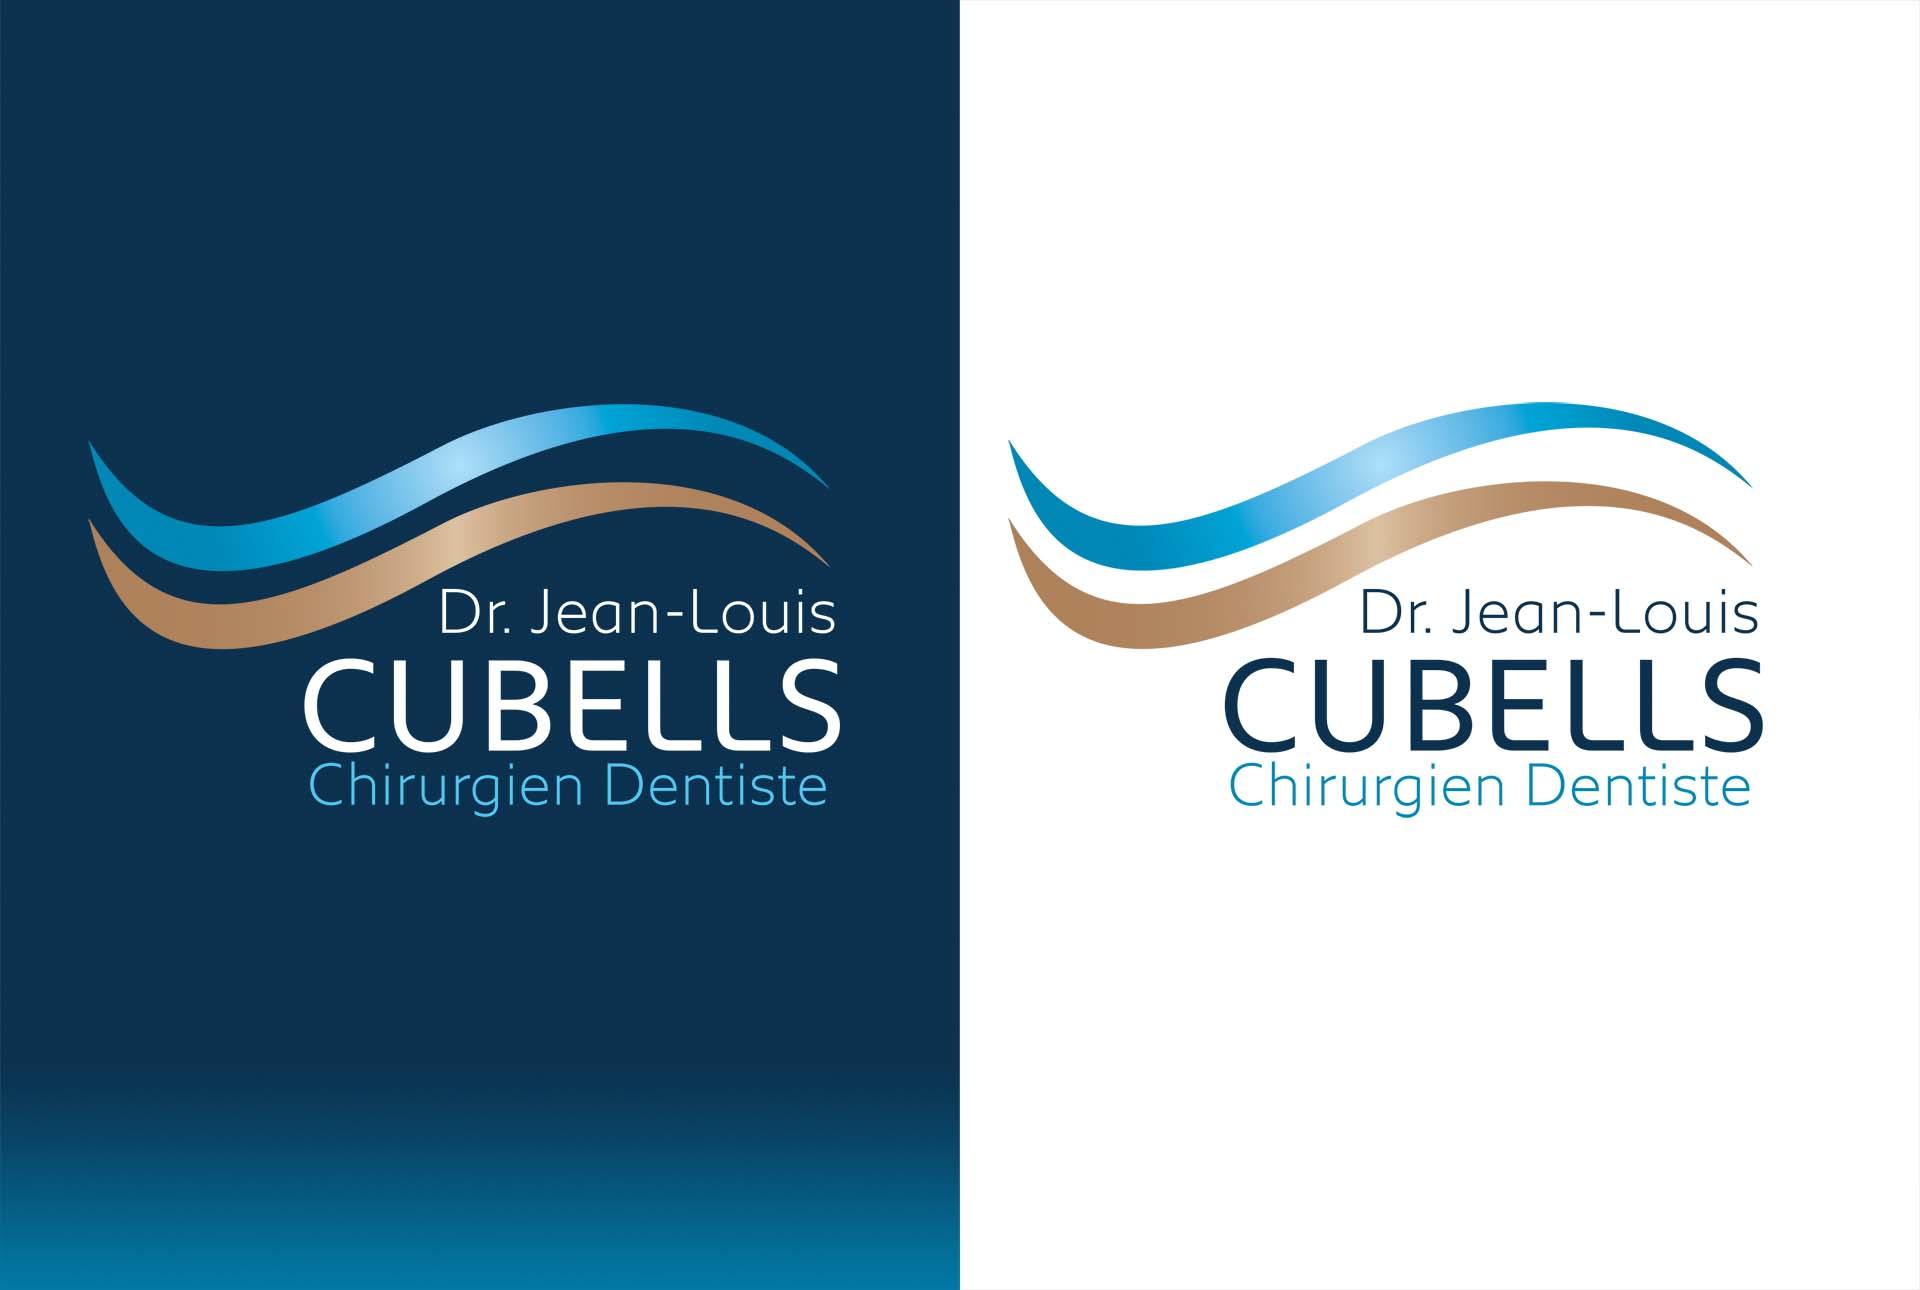 cubells creation logo docteur graphiste grenoble